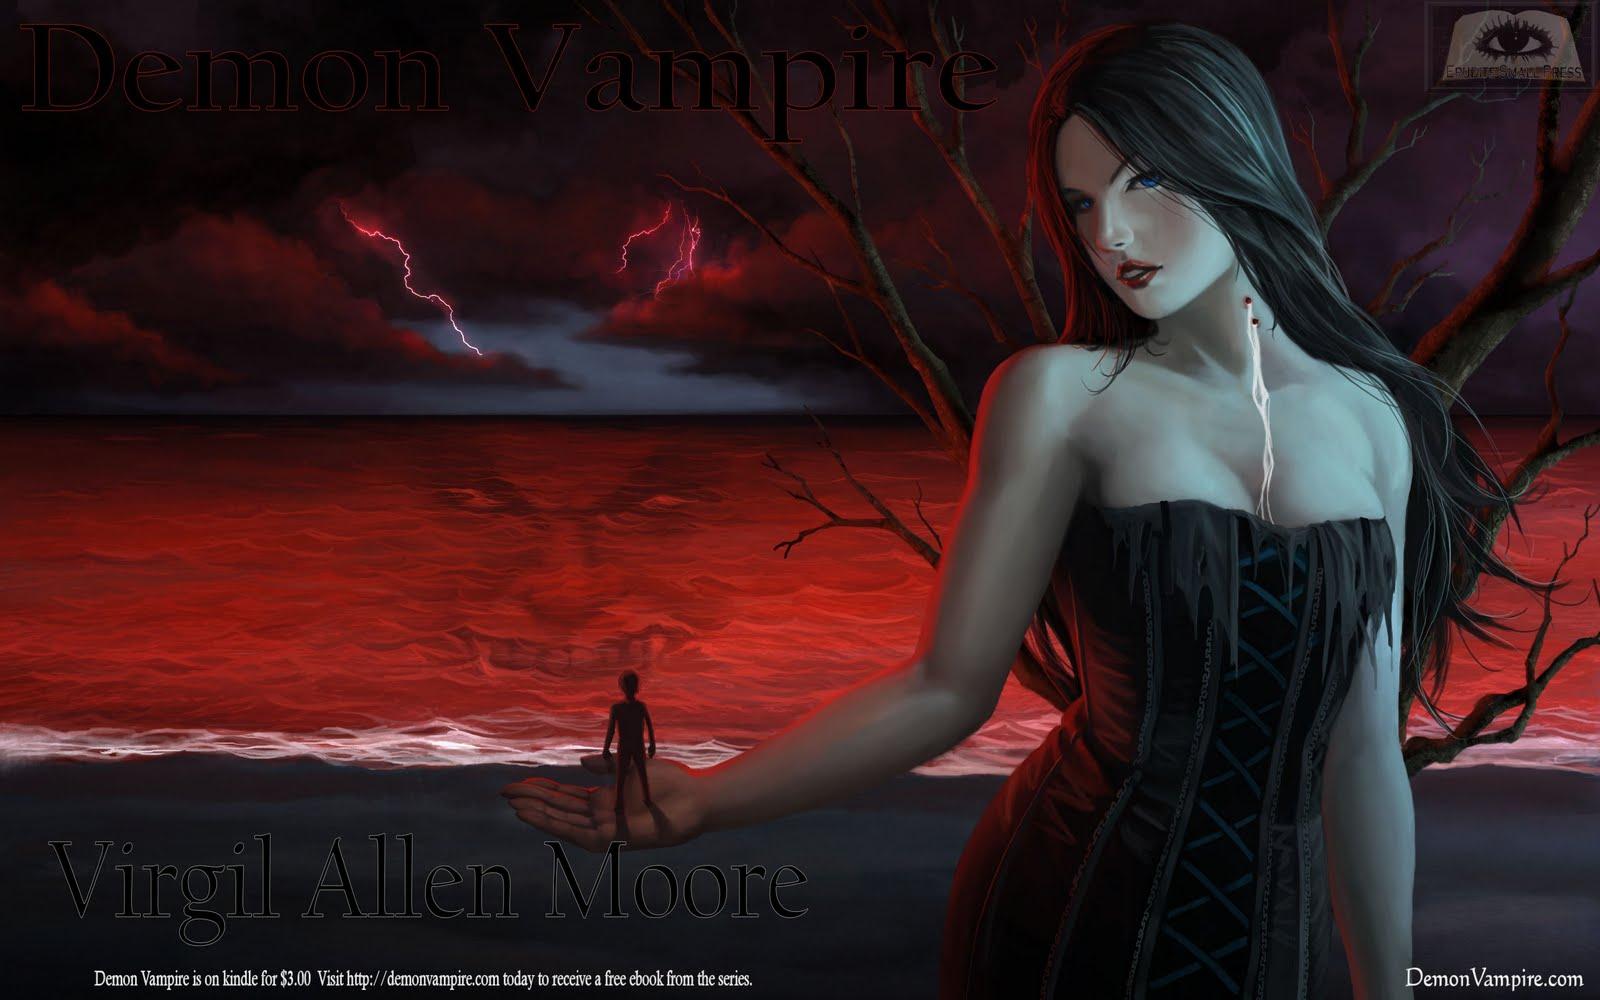 http://3.bp.blogspot.com/-fvEsyqPqfnA/TkKSaEeZXBI/AAAAAAAAASk/EBgfXc1eabQ/s1600/Demon+Vampire+Wallpaper+2560+x+1600.jpg